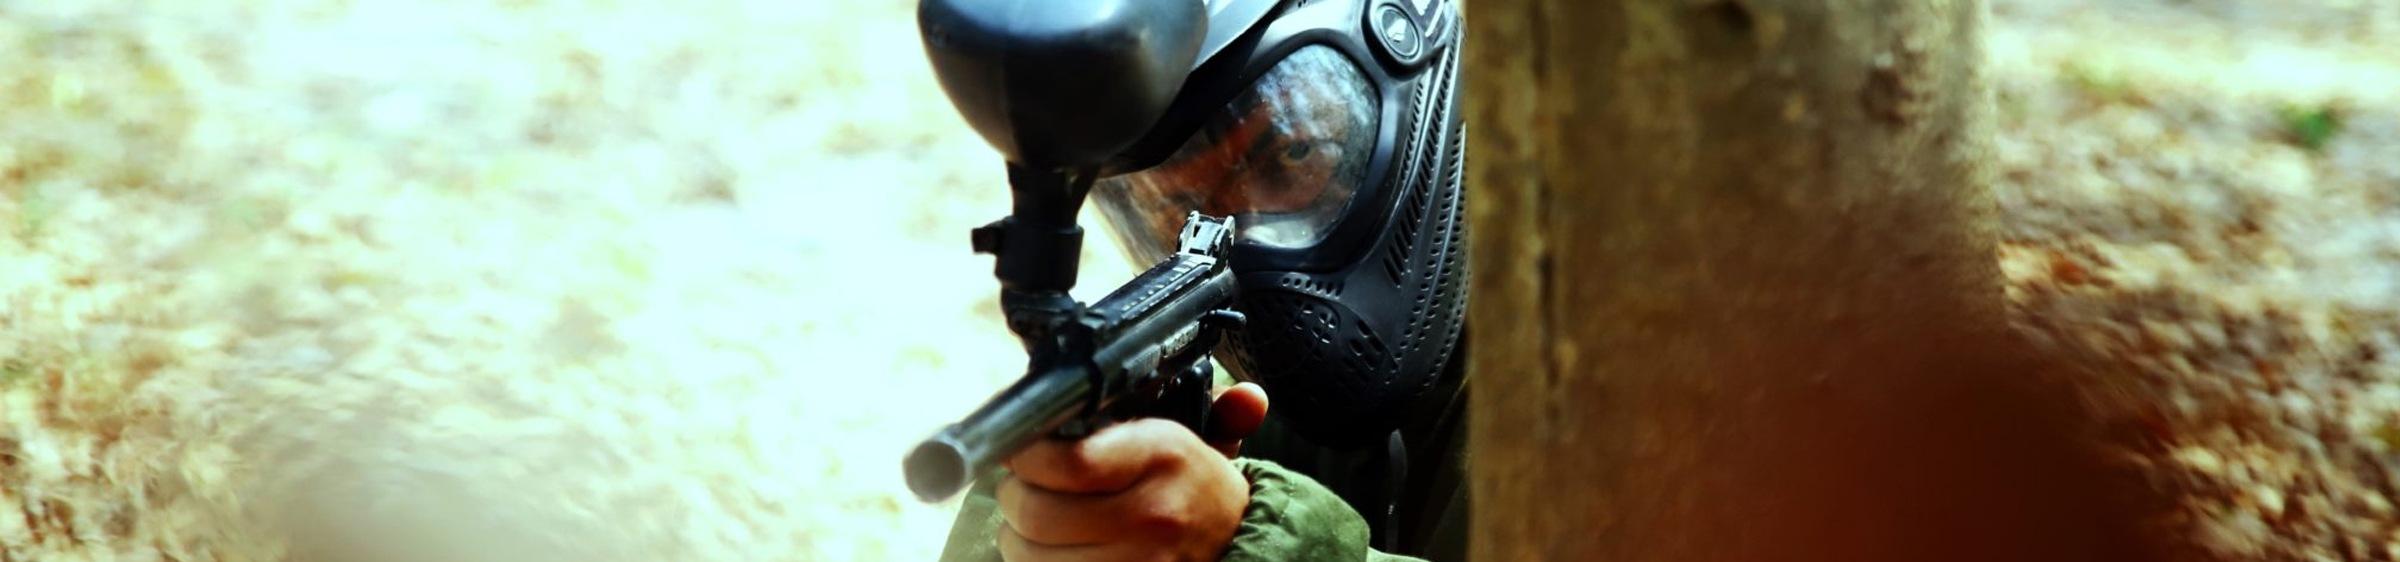 Man holding paintball gun